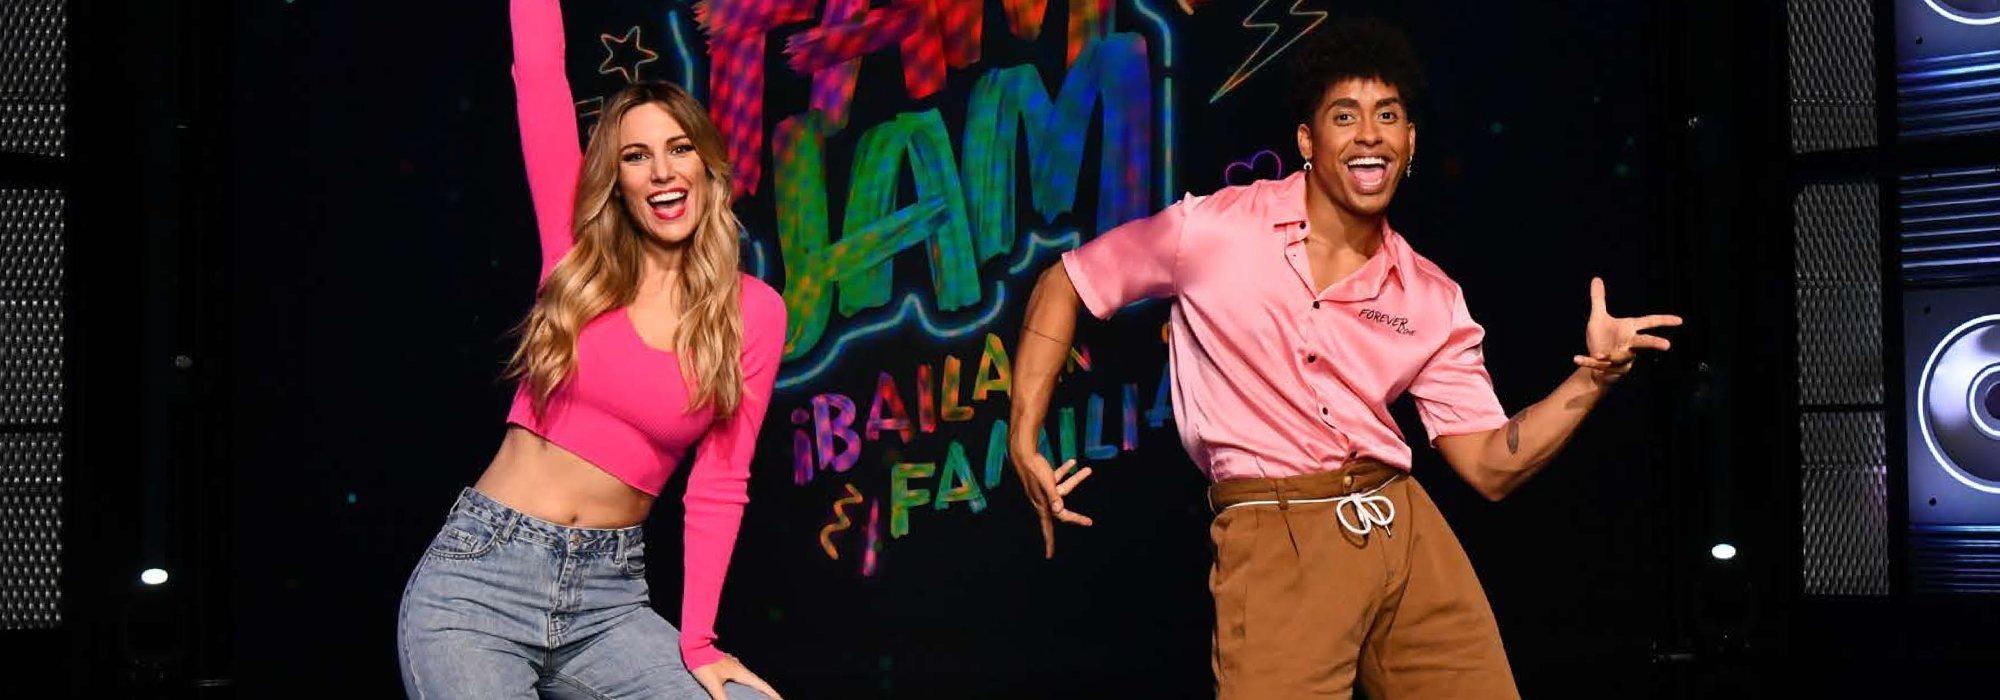 Fam Jam, ¡Baila en familia!